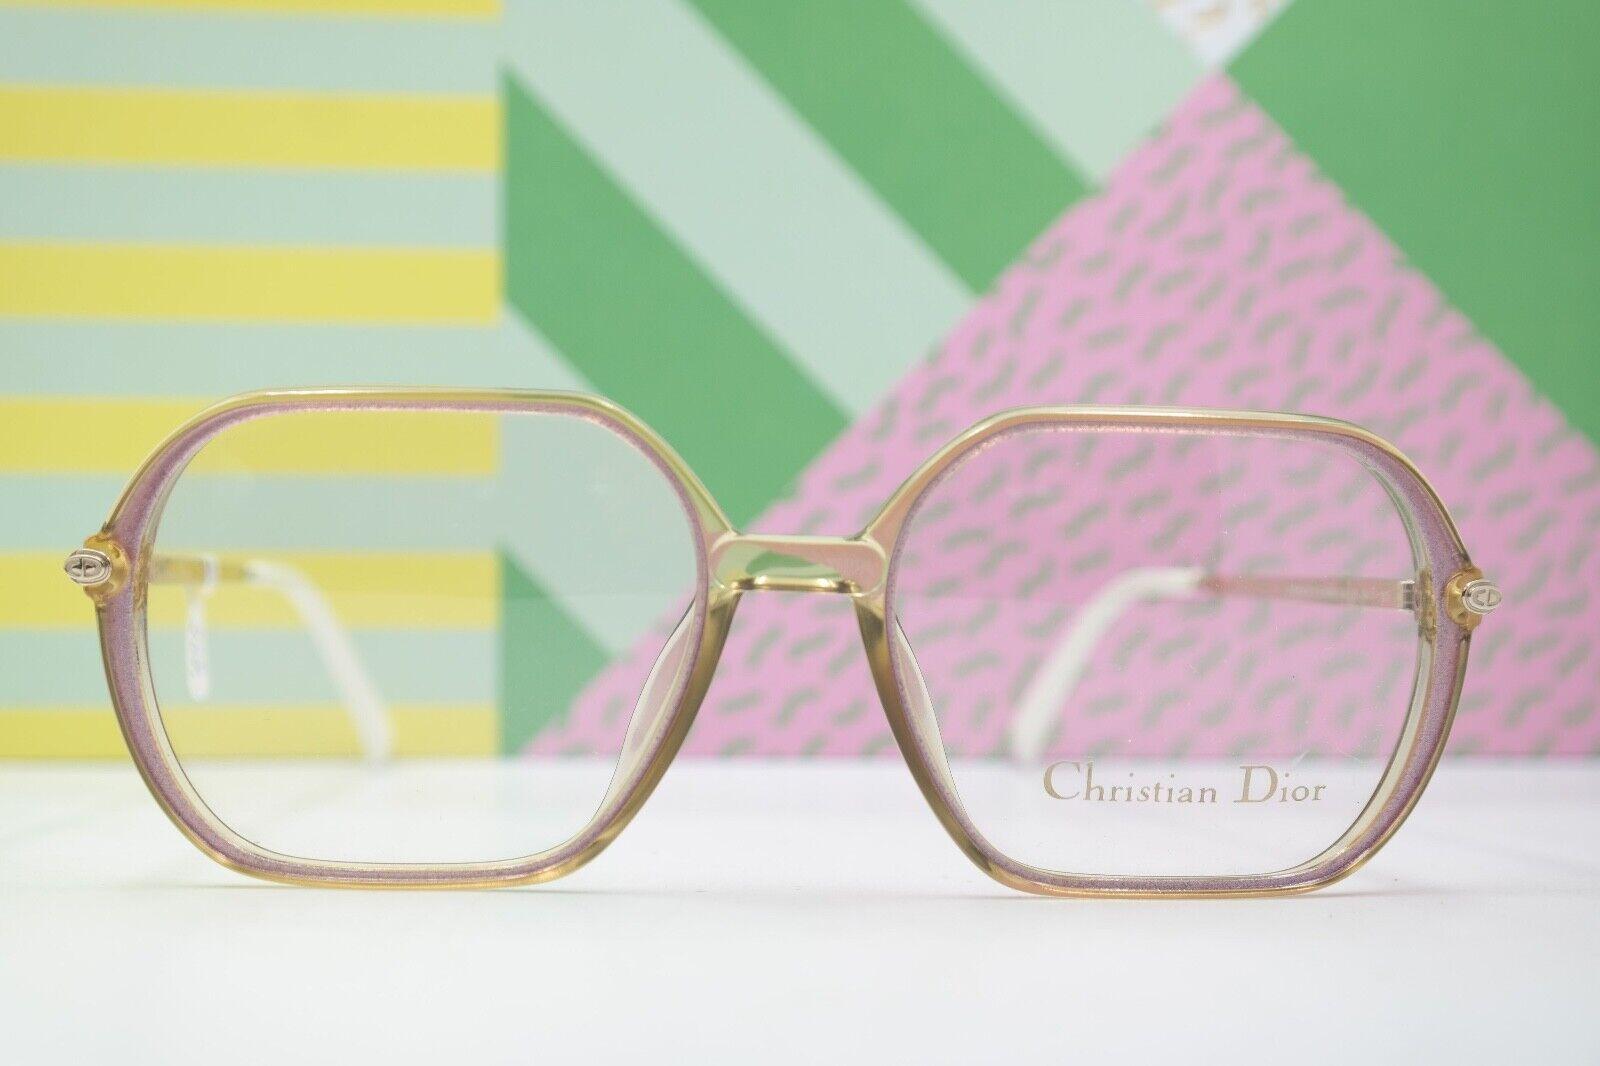 Brille Brillengestell Vintage Christian Dior 2343 80 lila silber 54/17 135 NOS